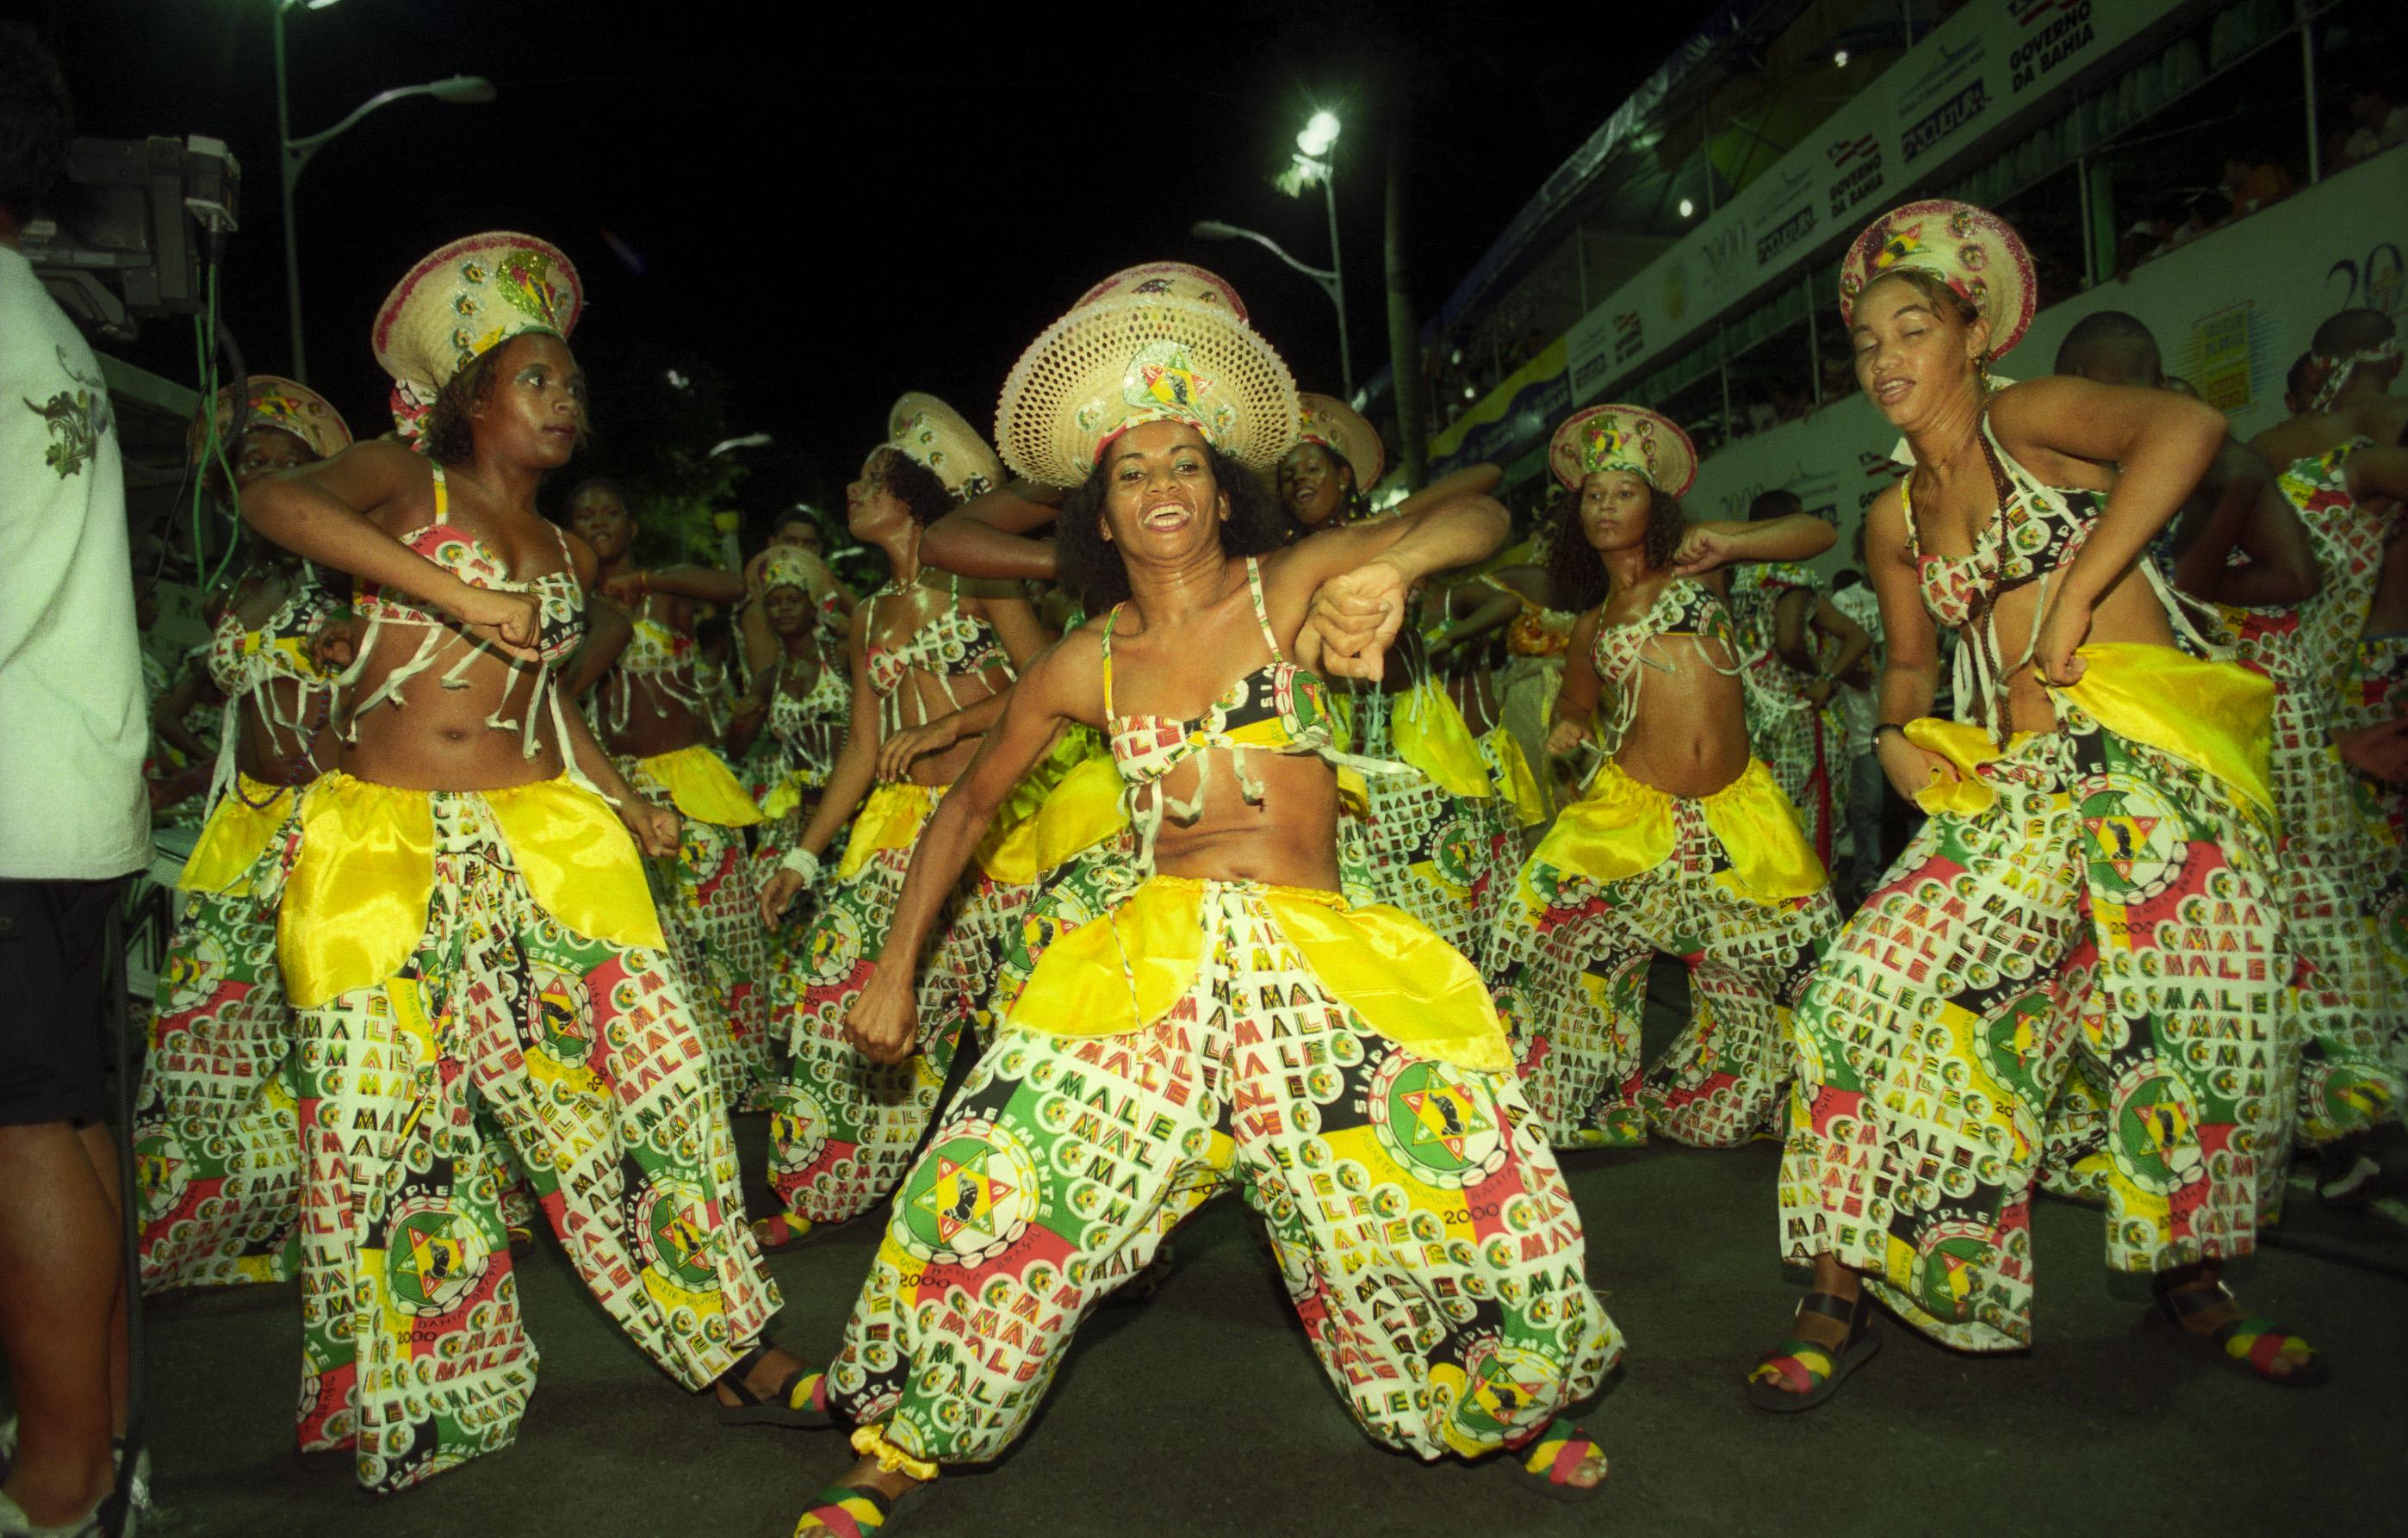 Carnaval 2000